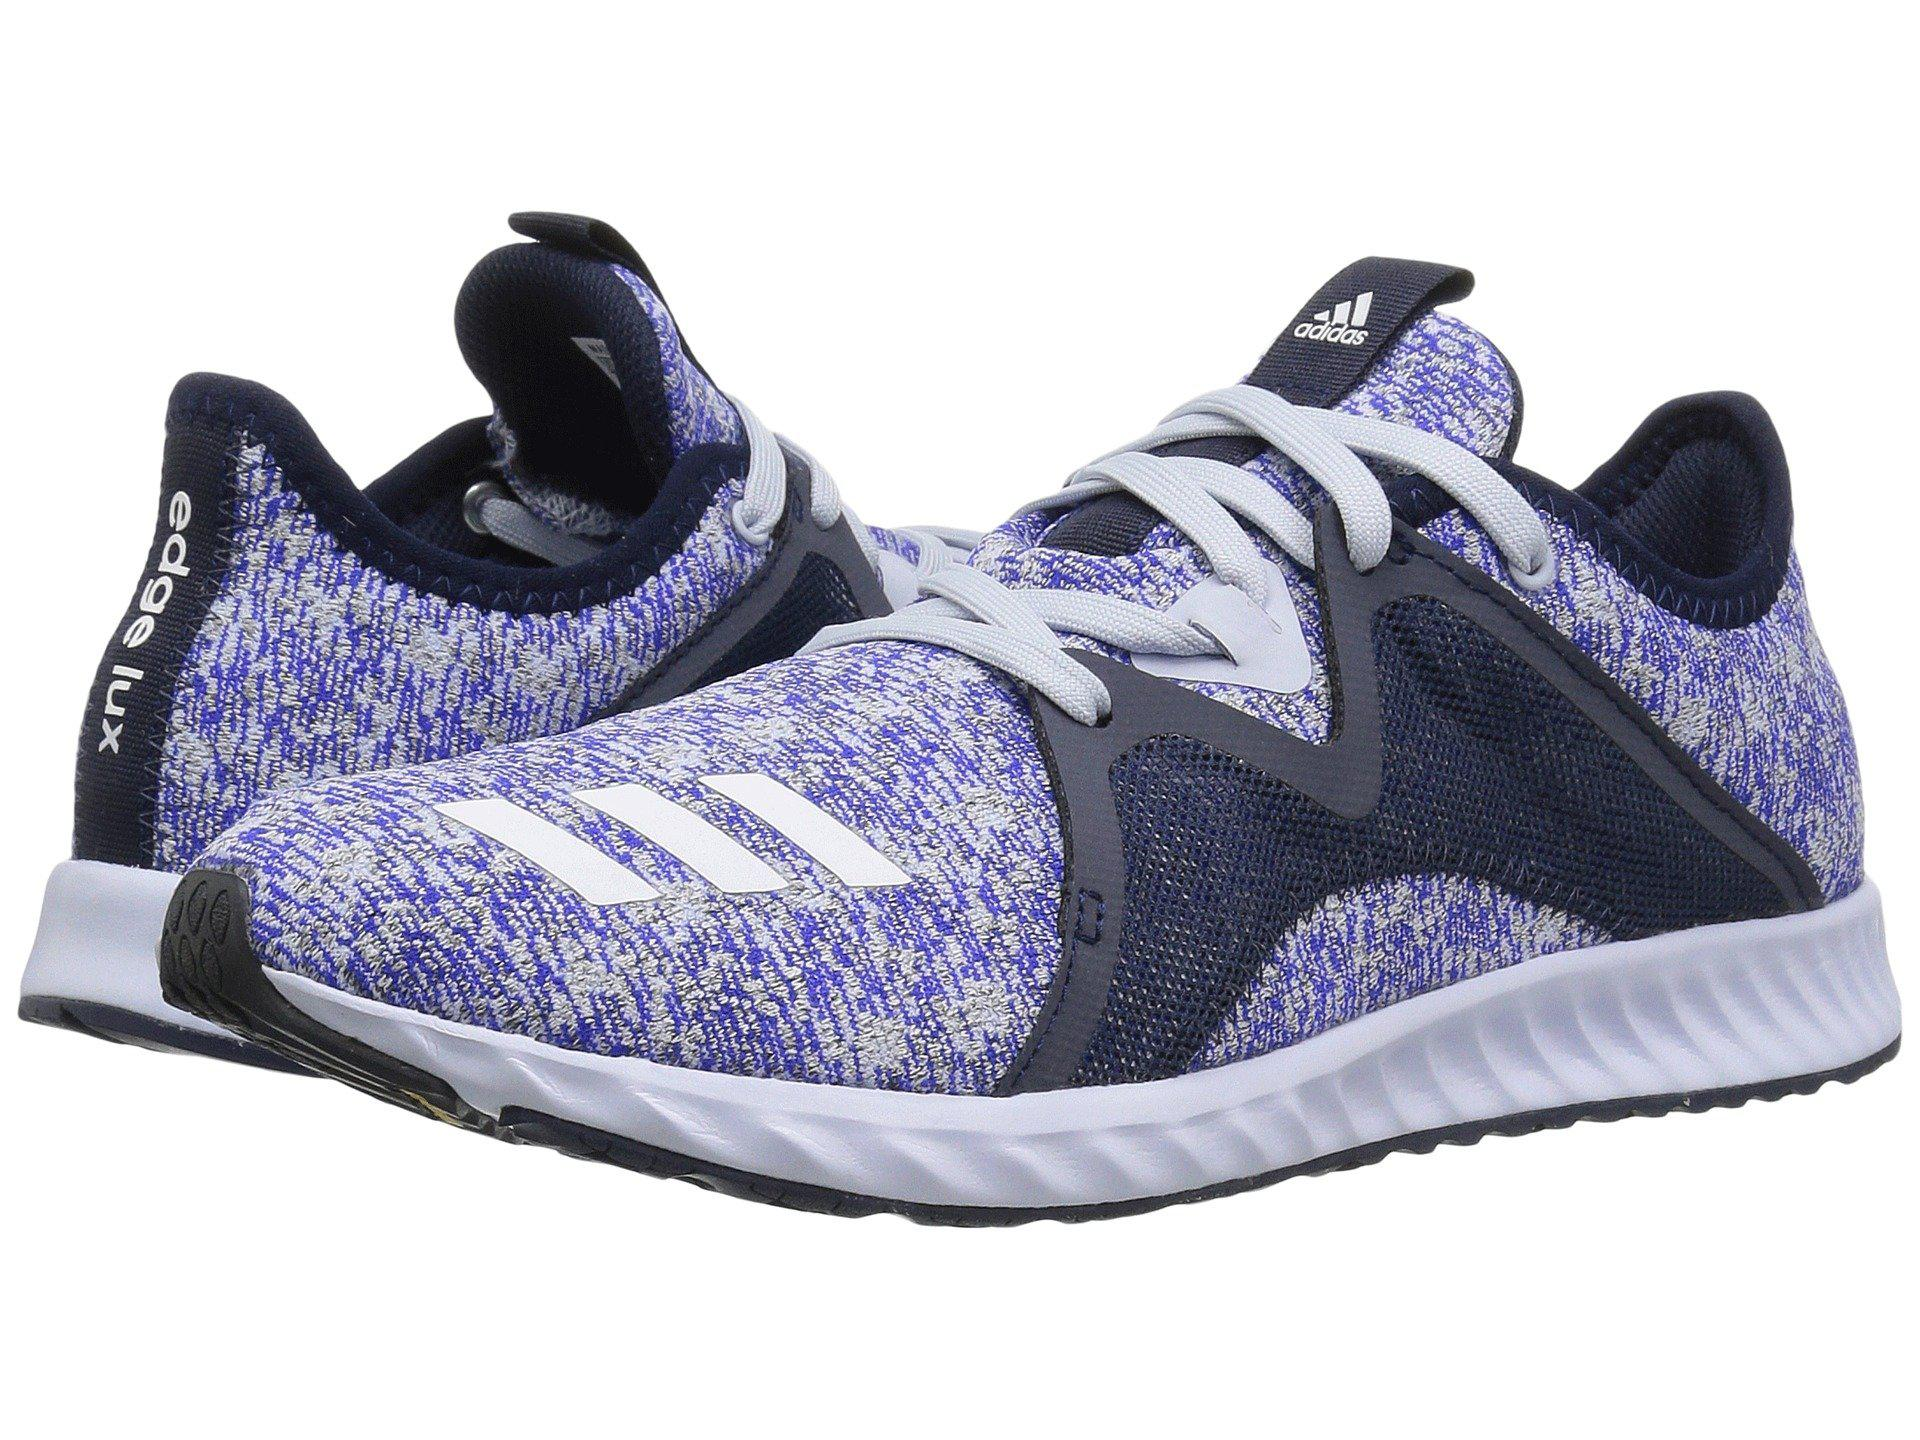 9e25b424432 Lyst - Adidas Originals Edge Luxe 2 in Blue - Save 50.588235294117645%